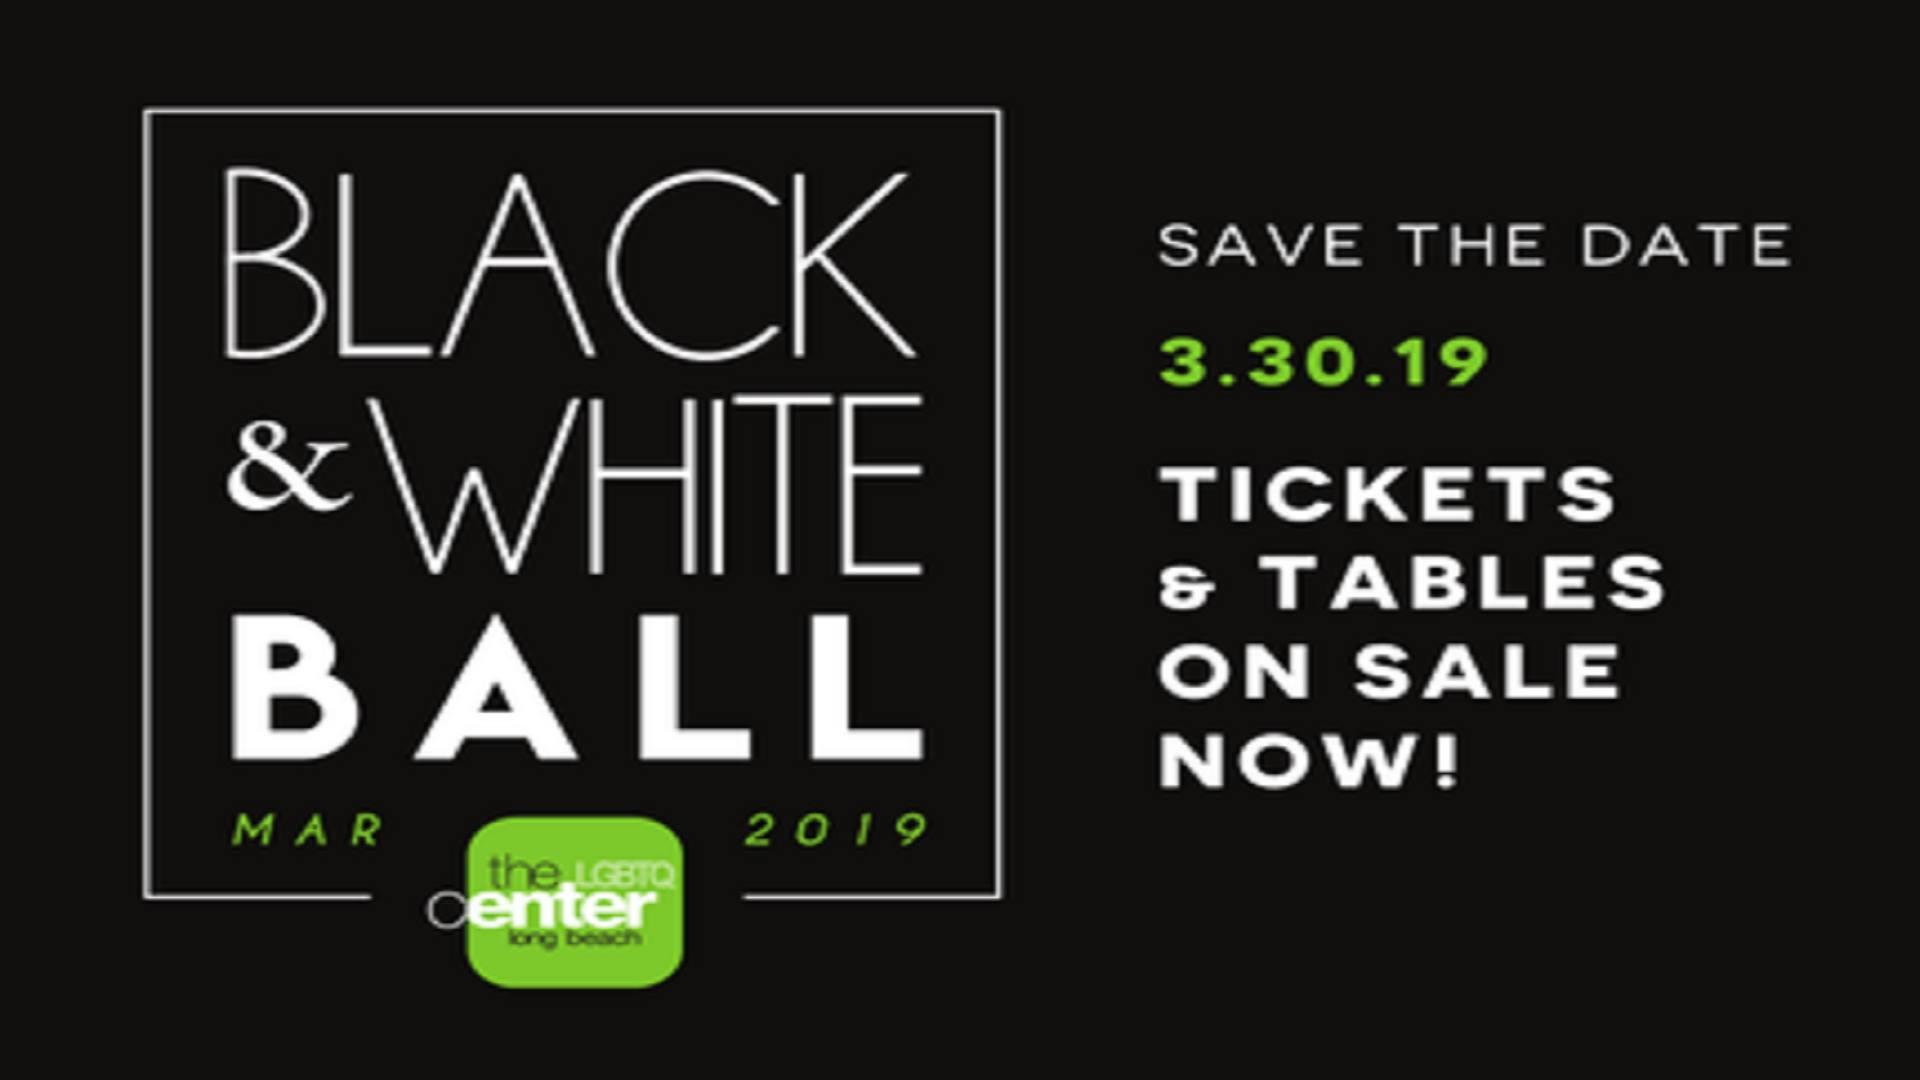 The 2019 Black & White Ball